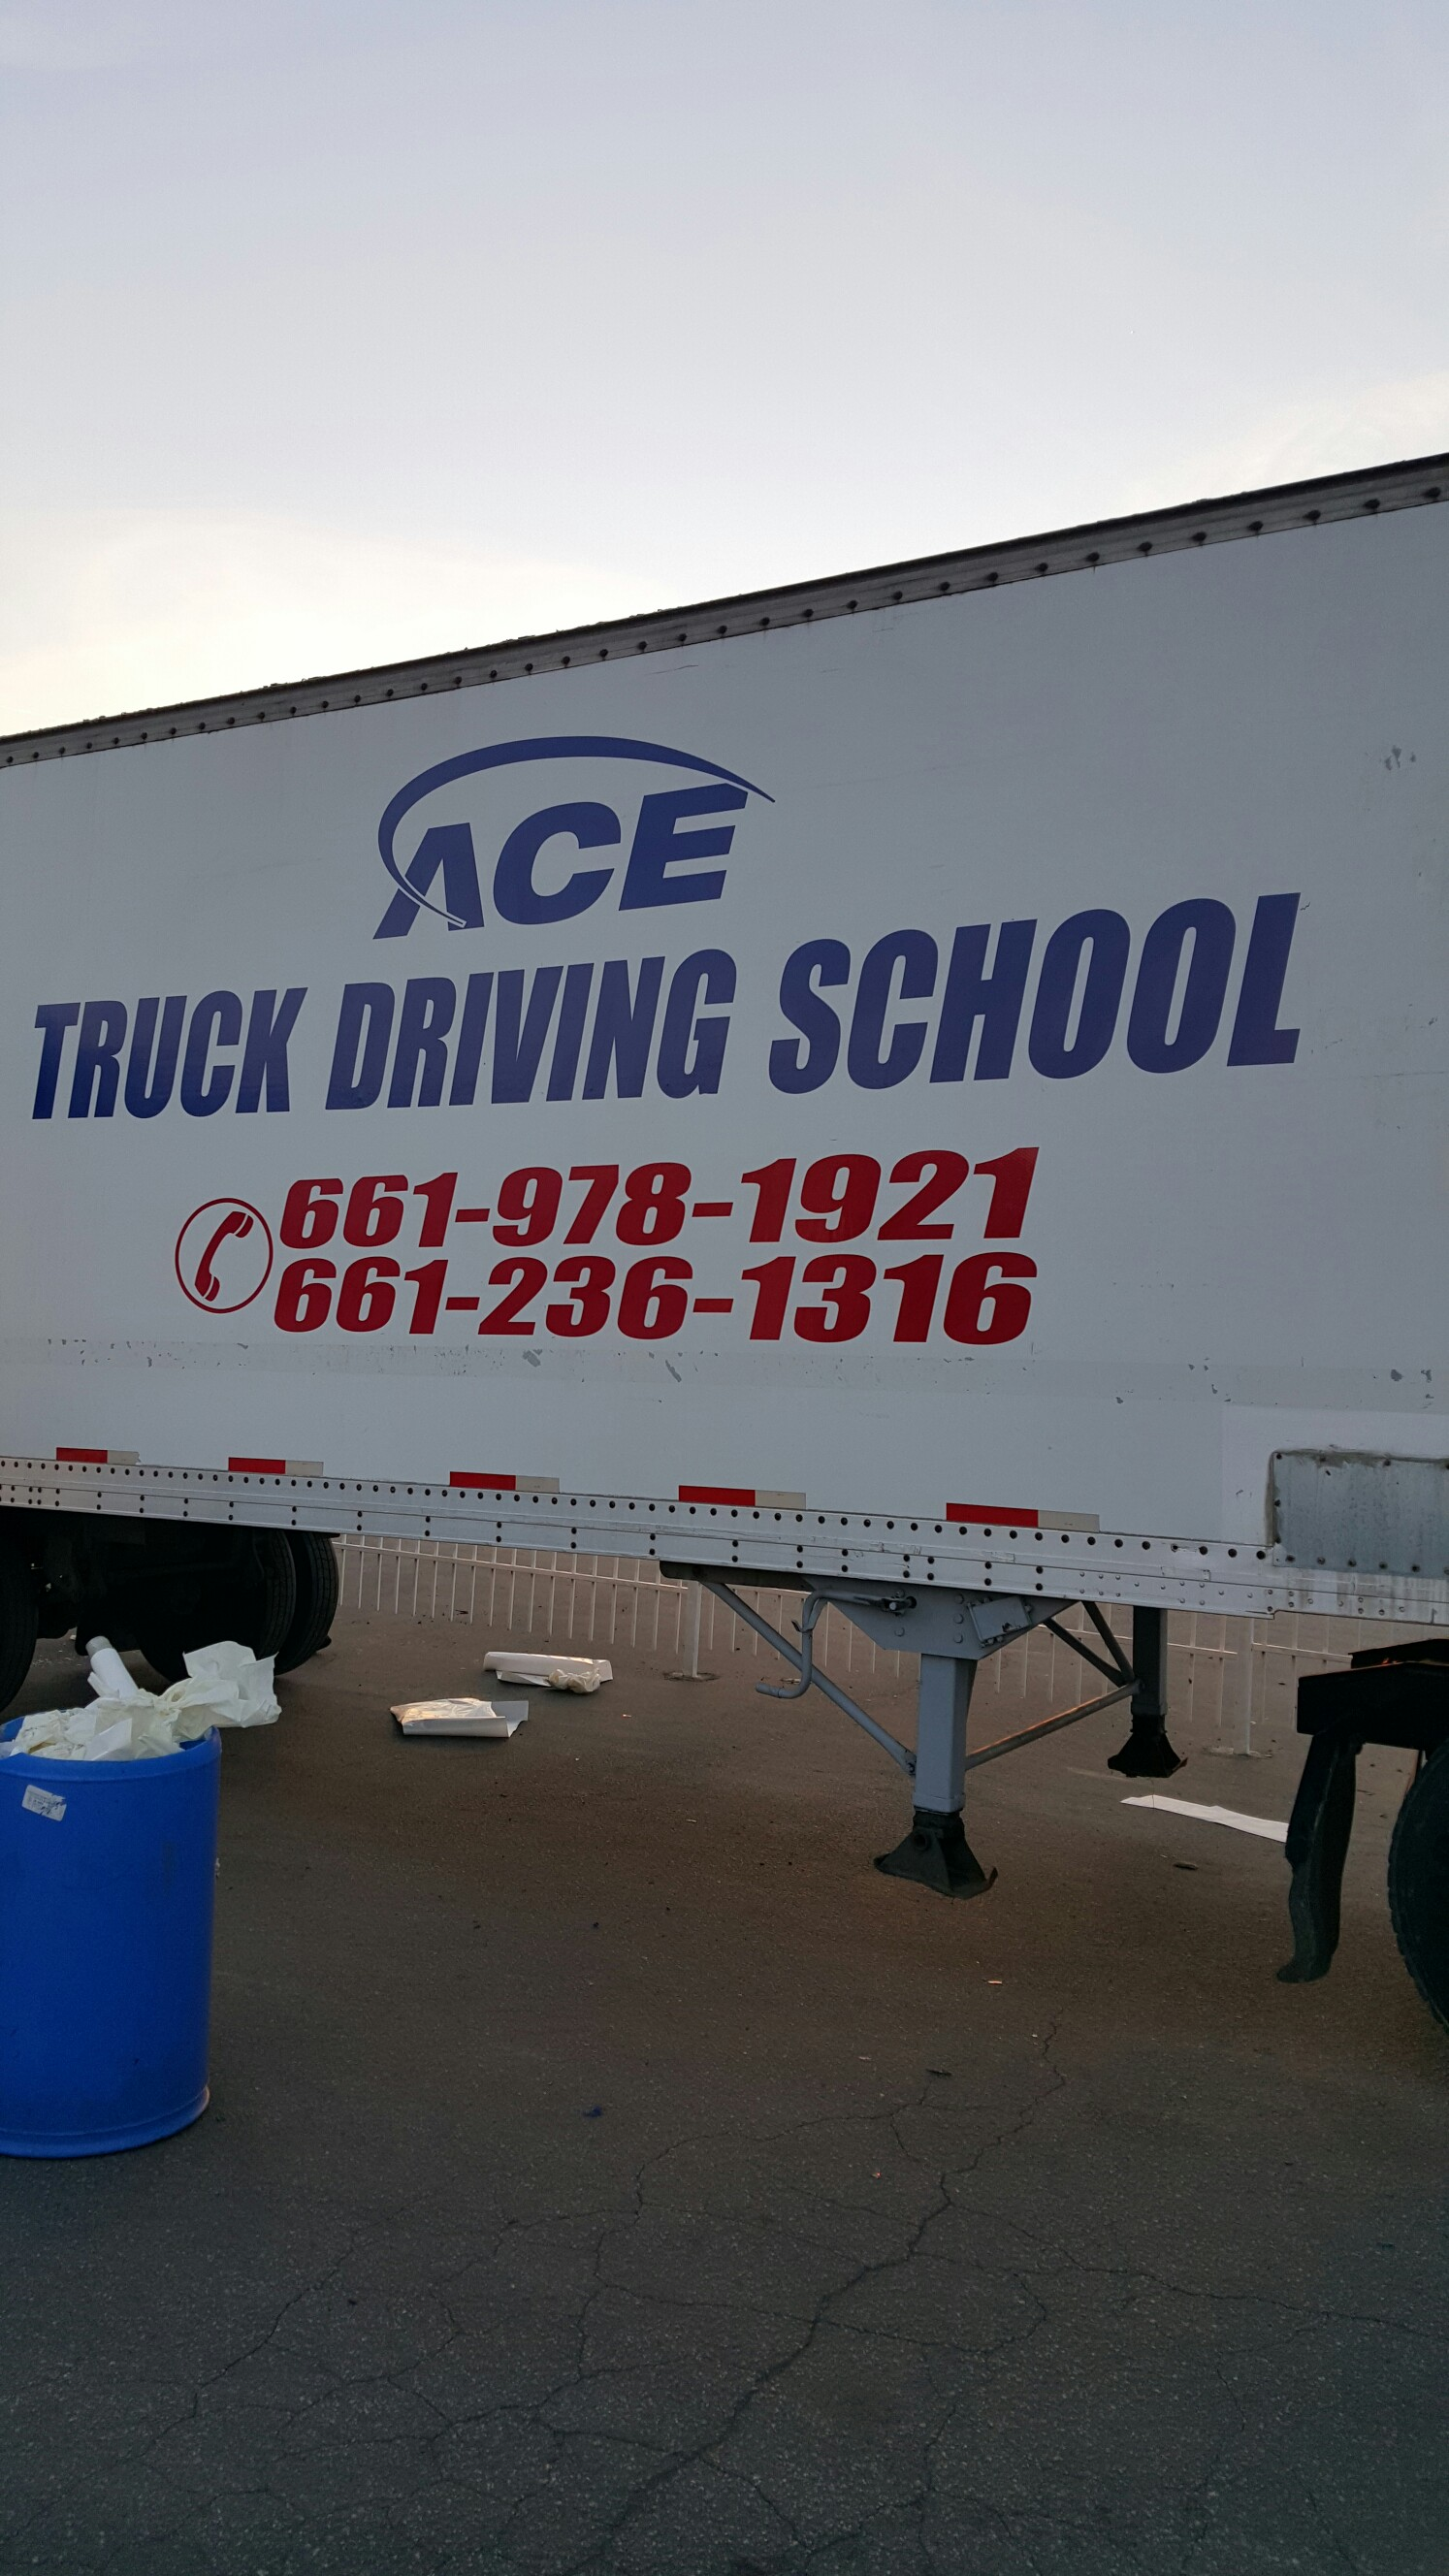 Ace Truck Driving School 1500 E Brundage Ln Bakersfield Ca 93307